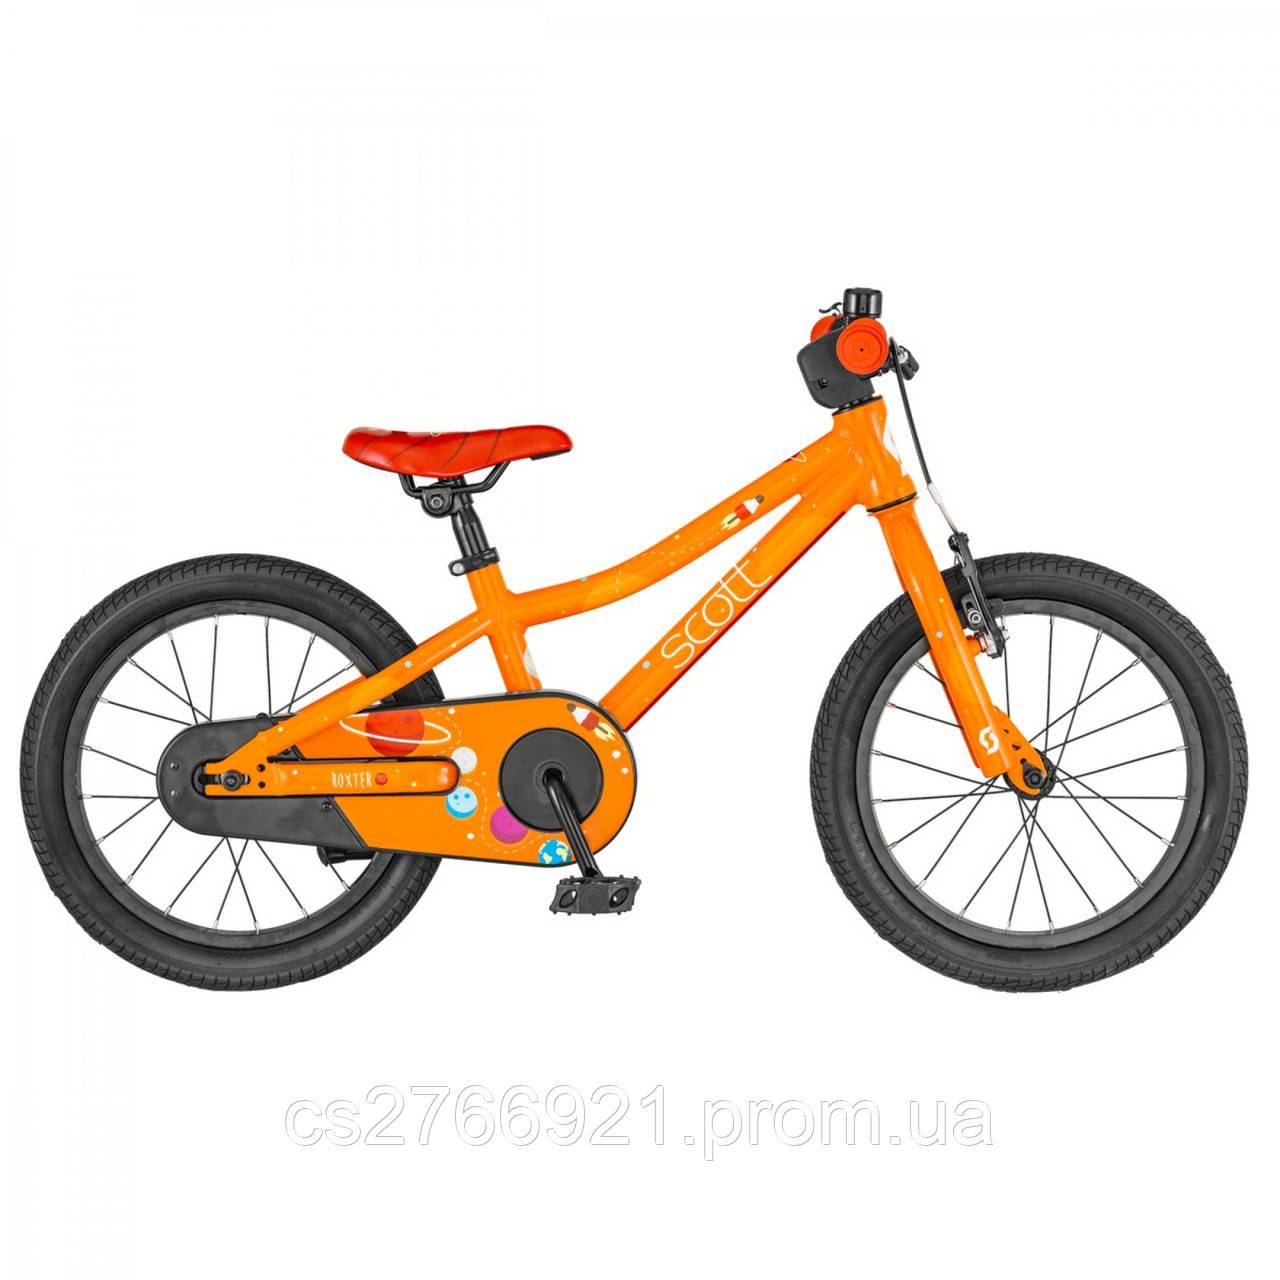 Велосипед SCOTT Roxter 16 (CN) 19